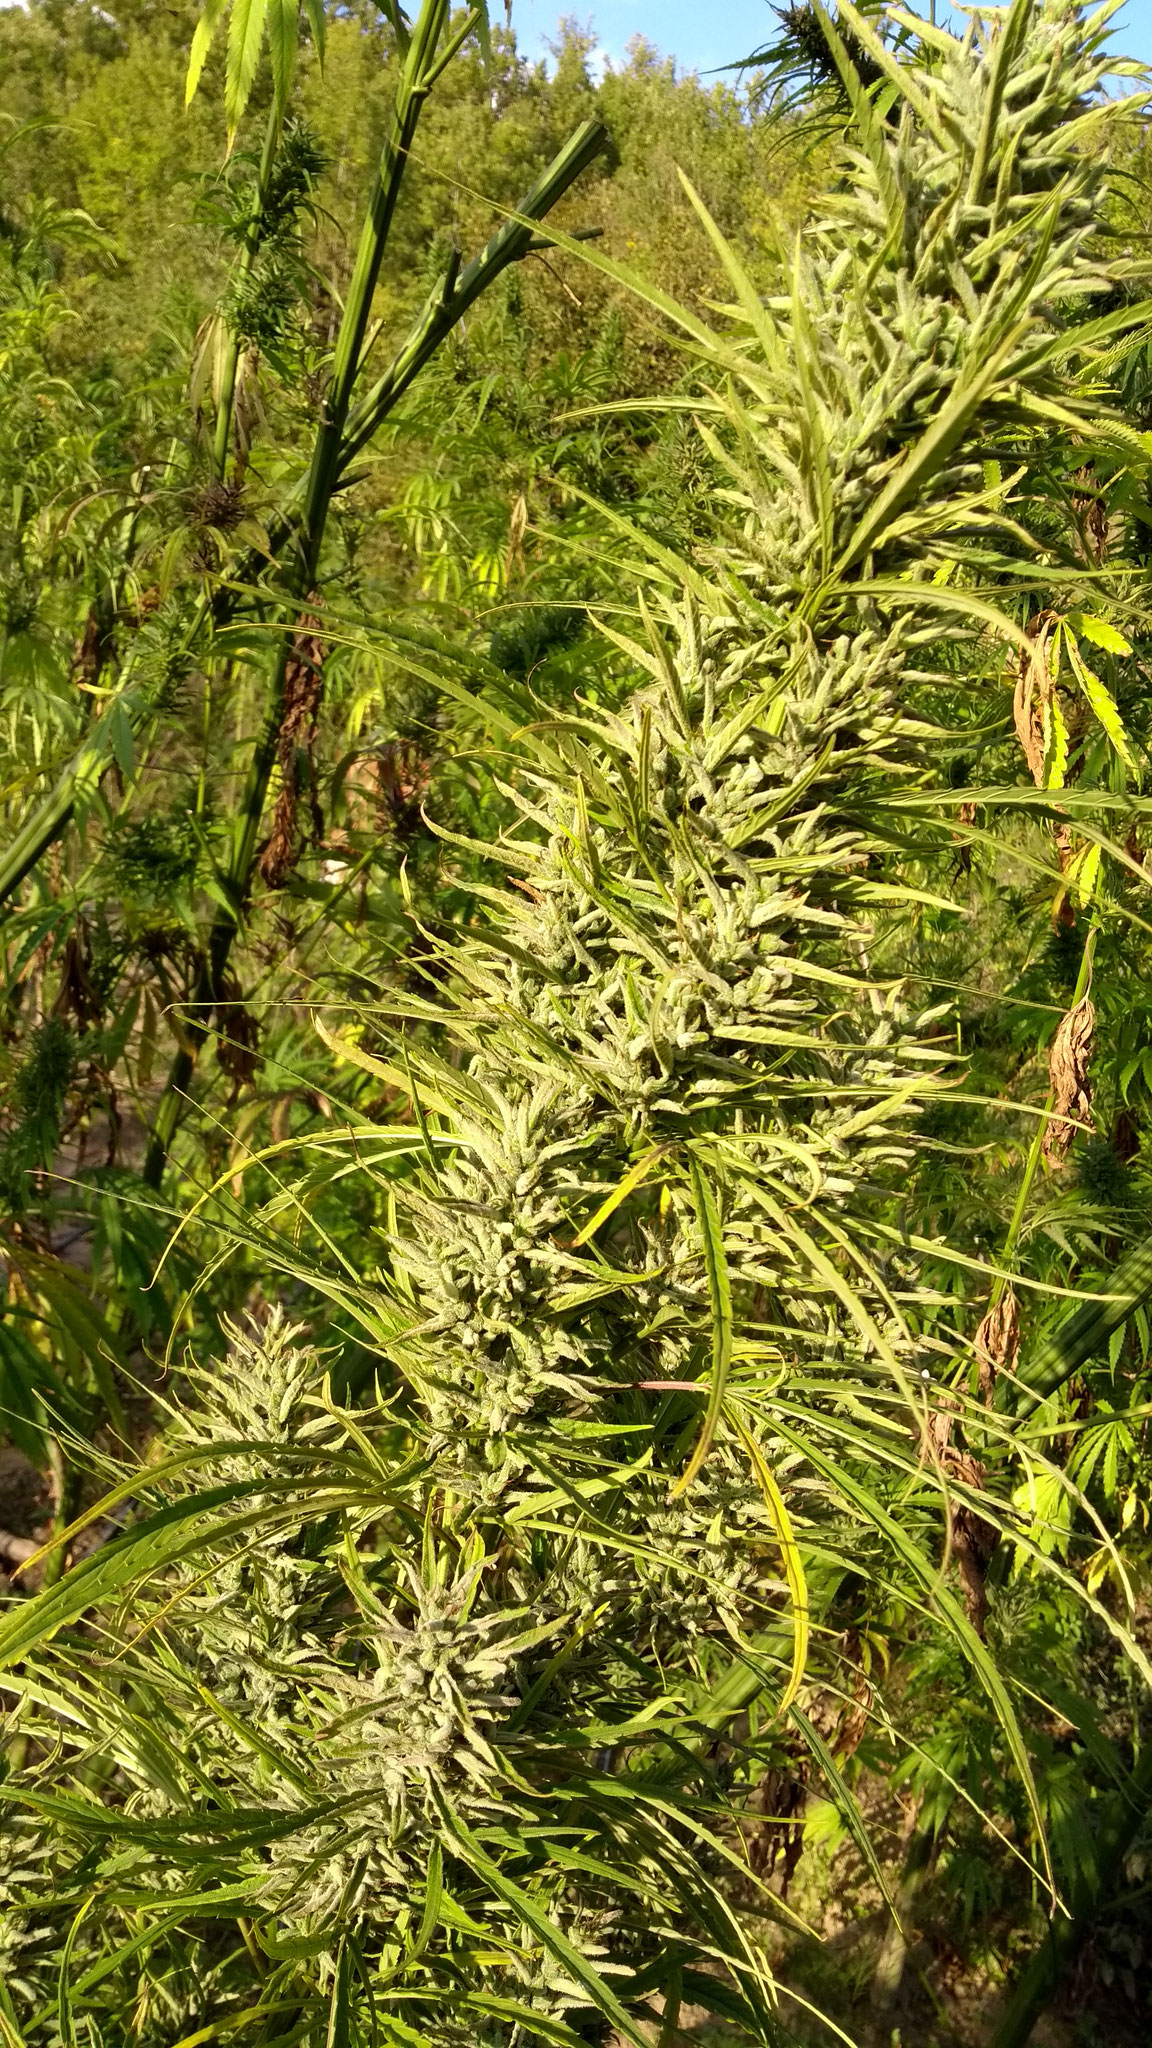 tiborszallasi hemp